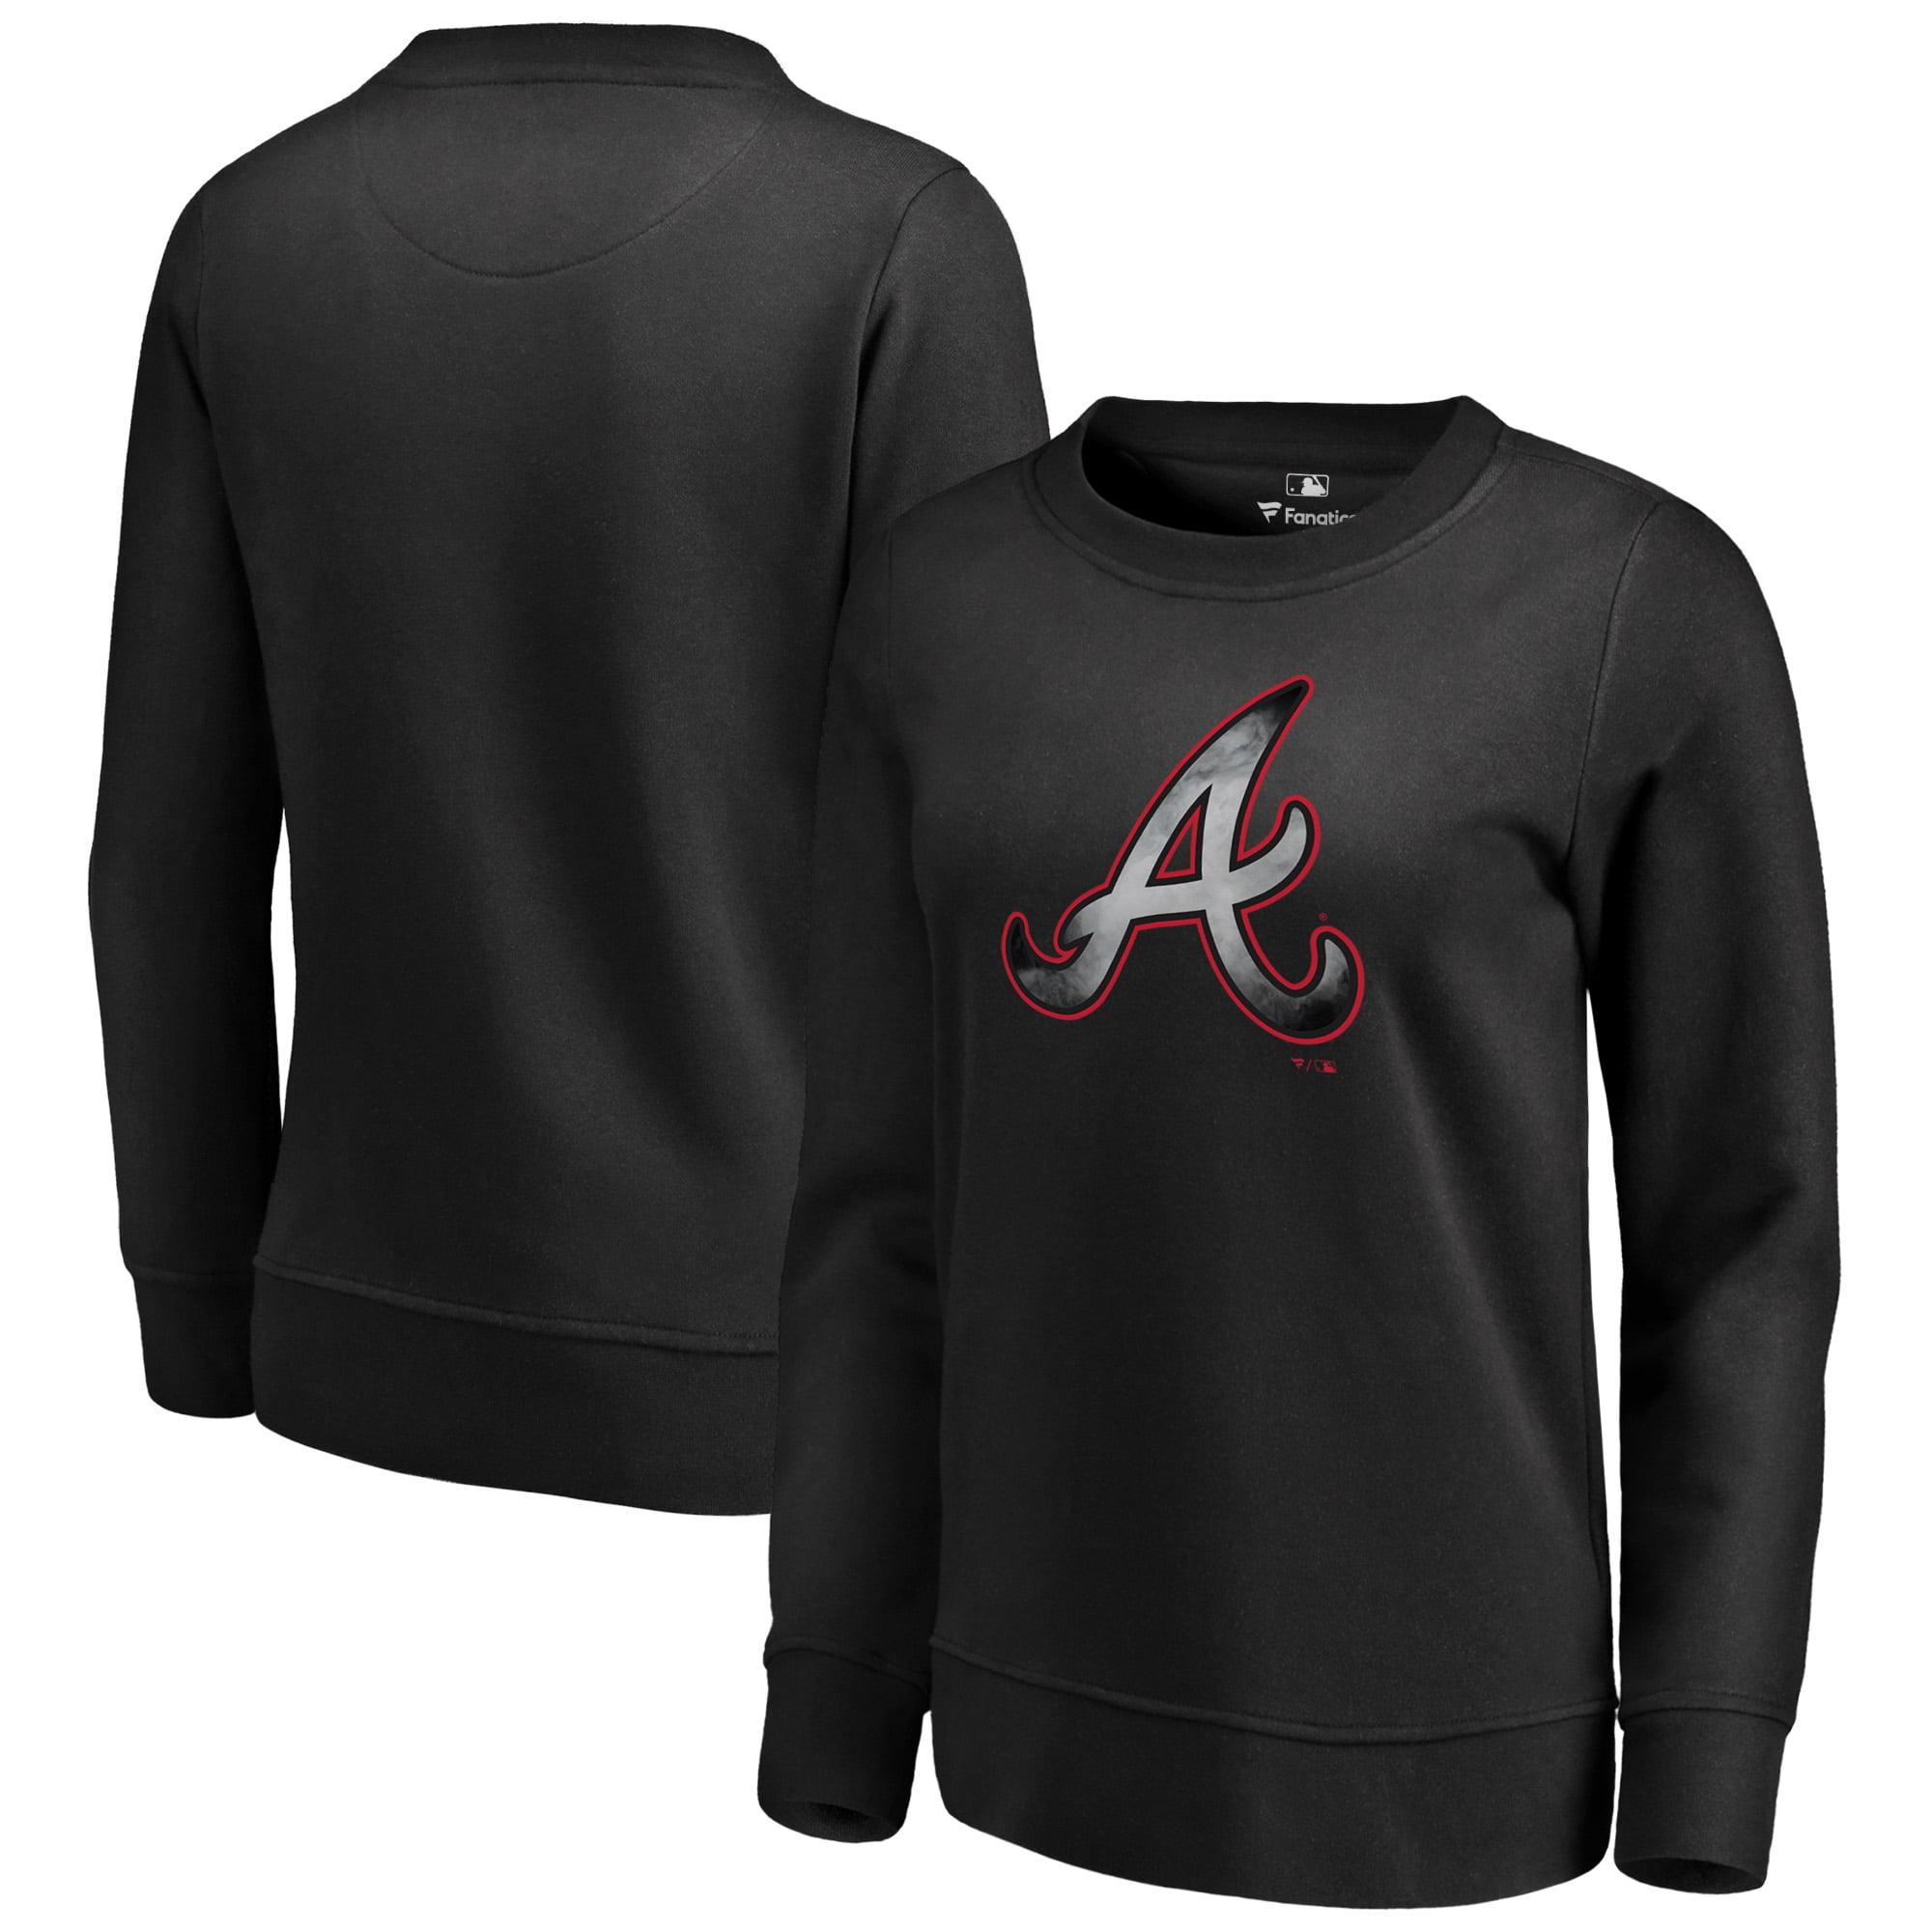 Atlanta Braves Fanatics Branded Women's Core Smoke Fleece Sweatshirt - Black